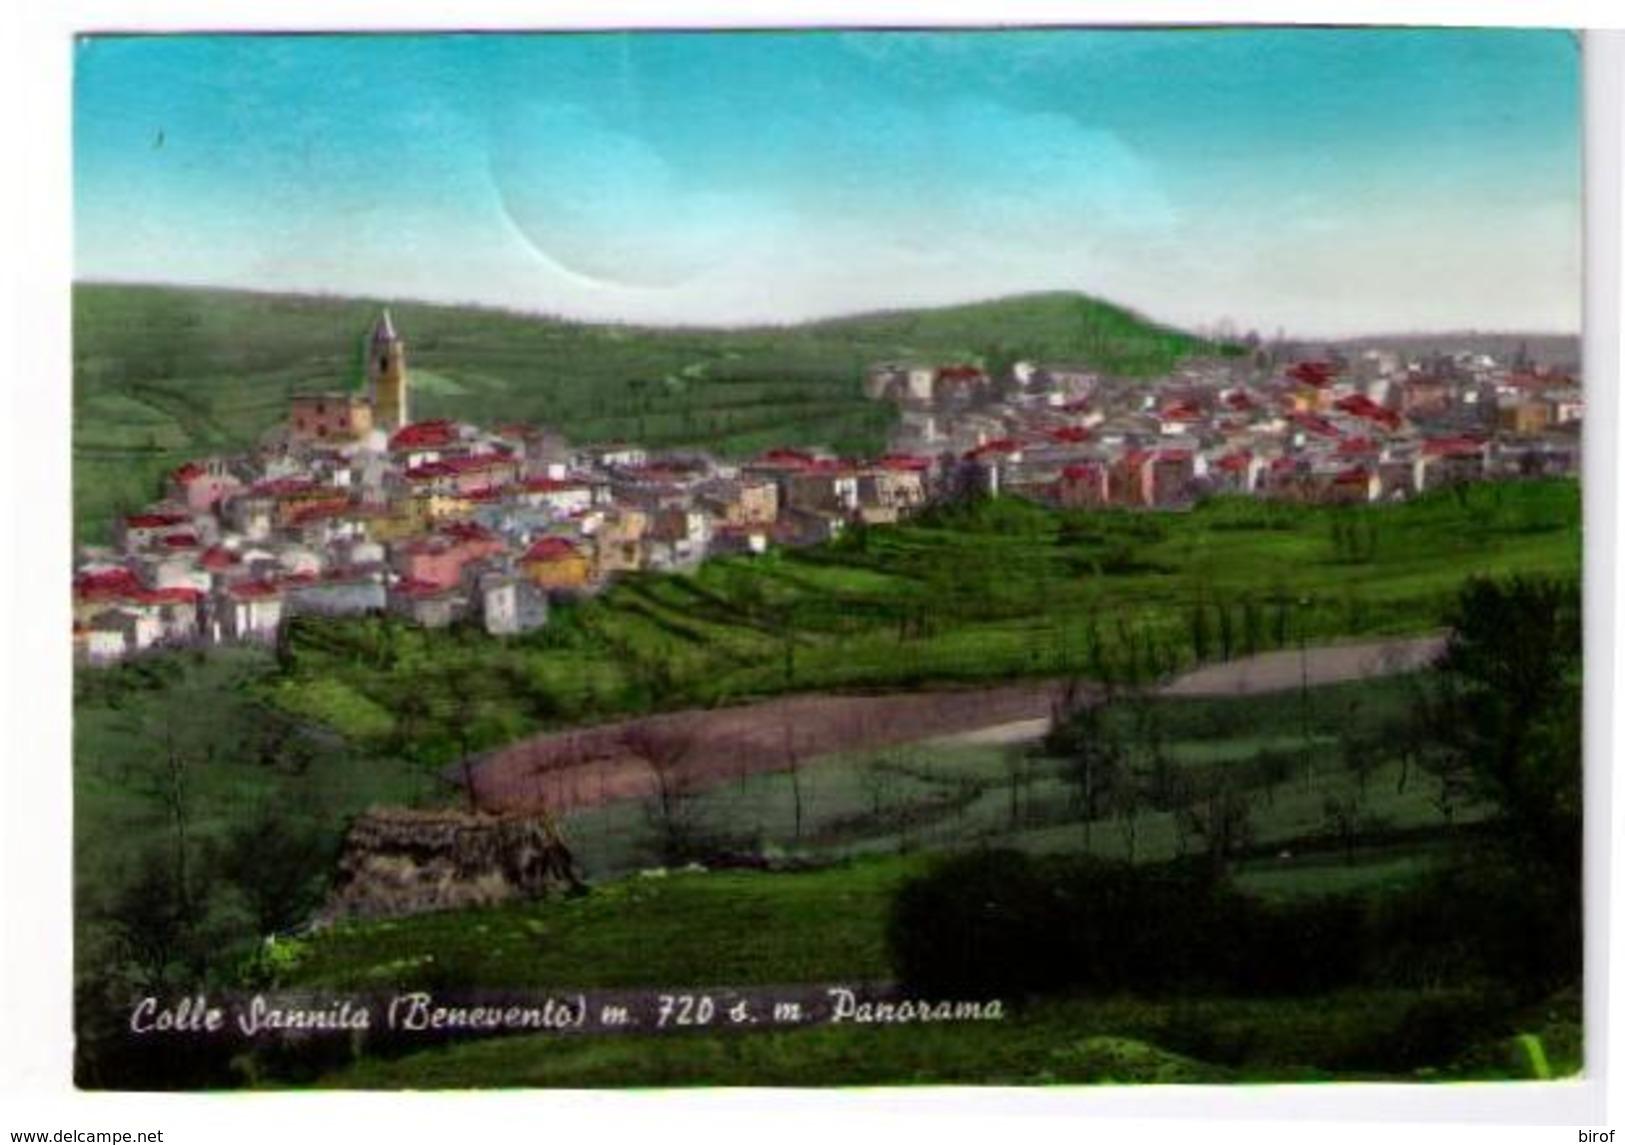 COLLE SANNITA M . 720 S.M. PANORAMA BENEVENTO -  (BN) - Benevento